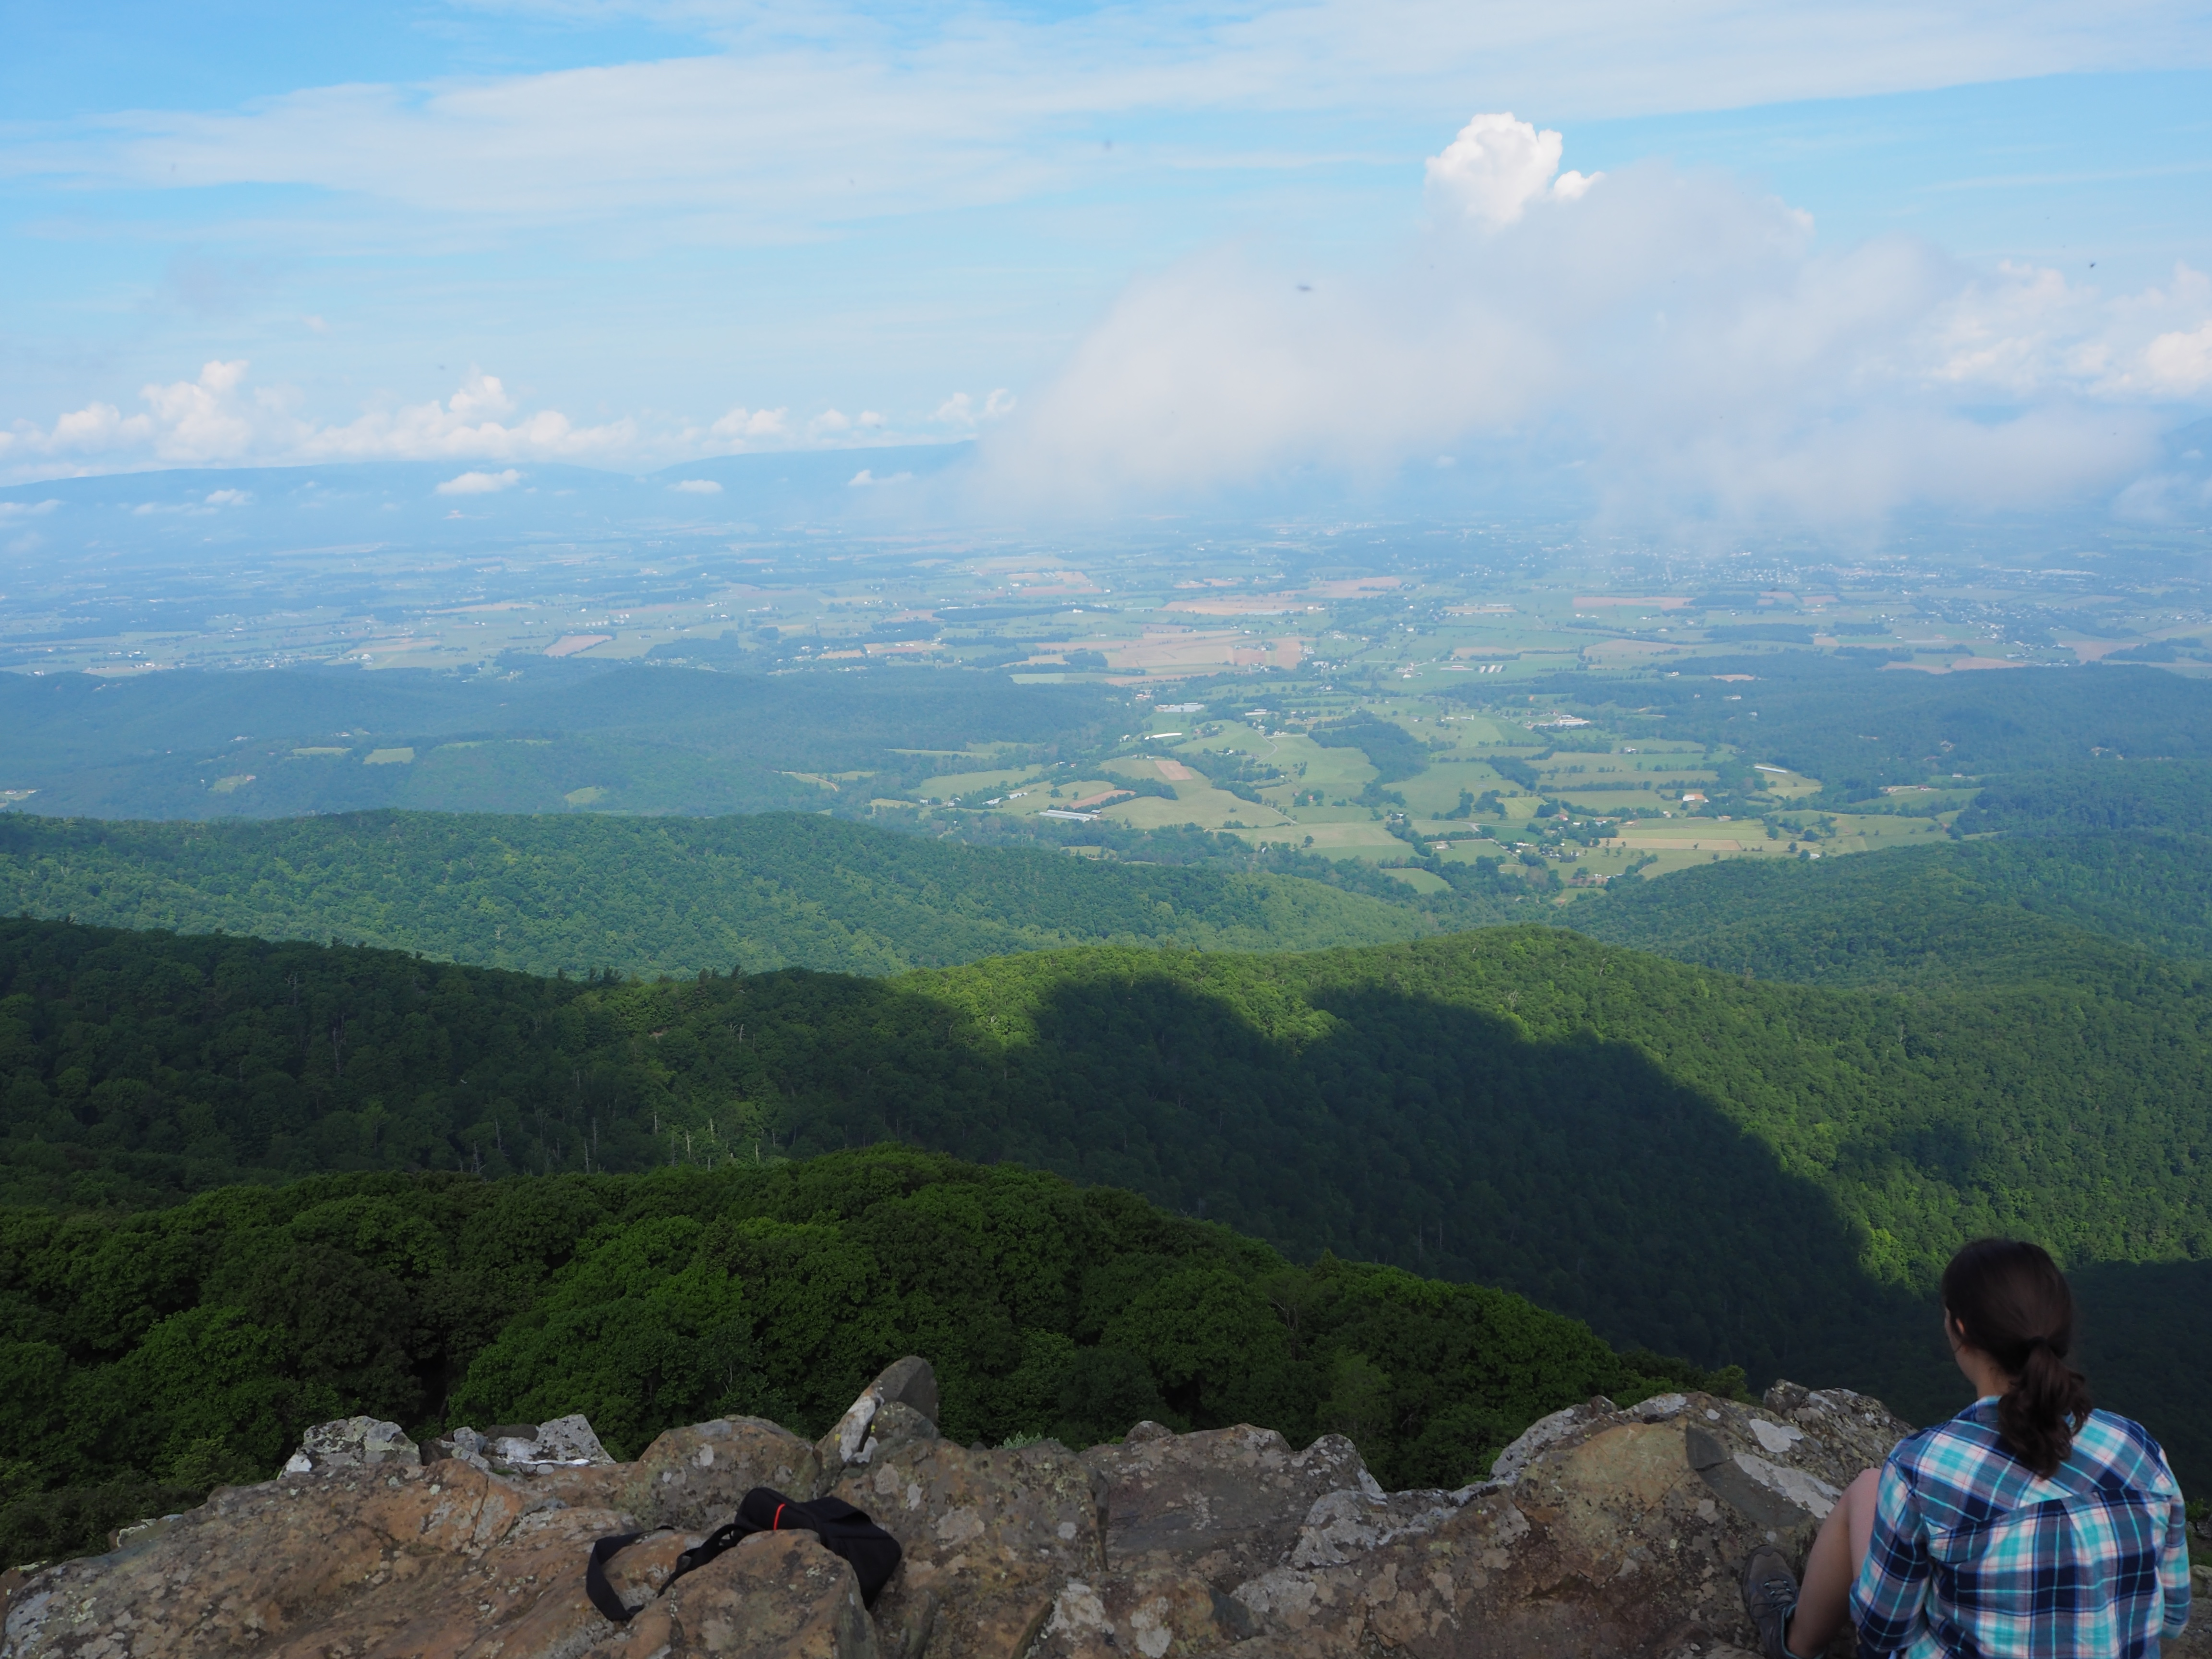 Stonyman Summit, Shenandoah National Park